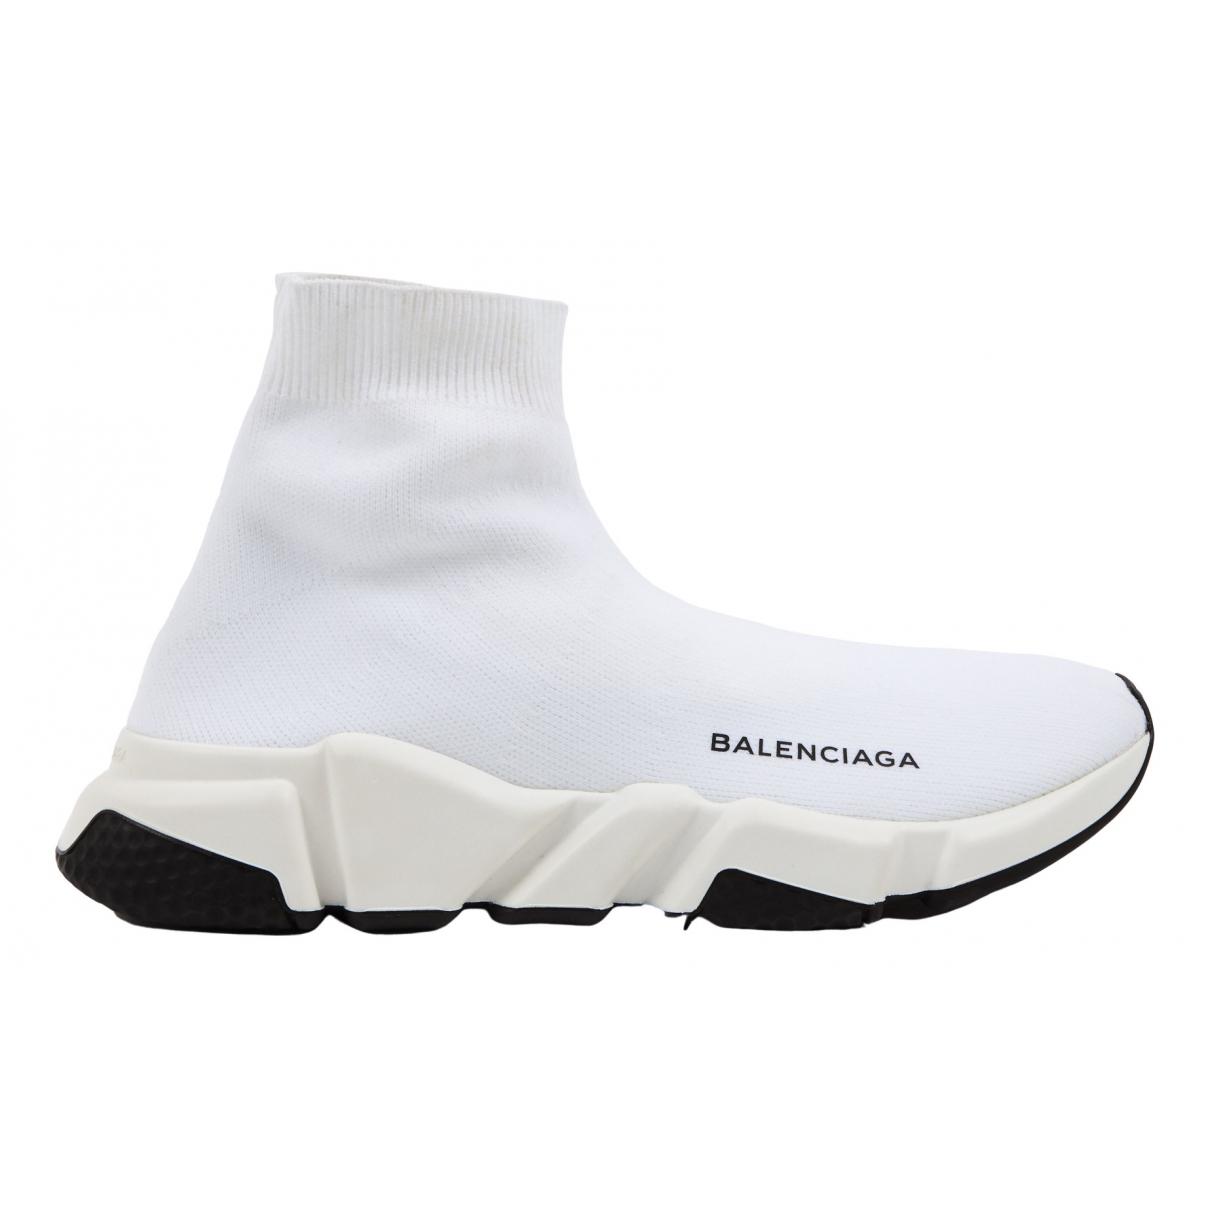 Balenciaga - Baskets Speed pour femme en toile - blanc